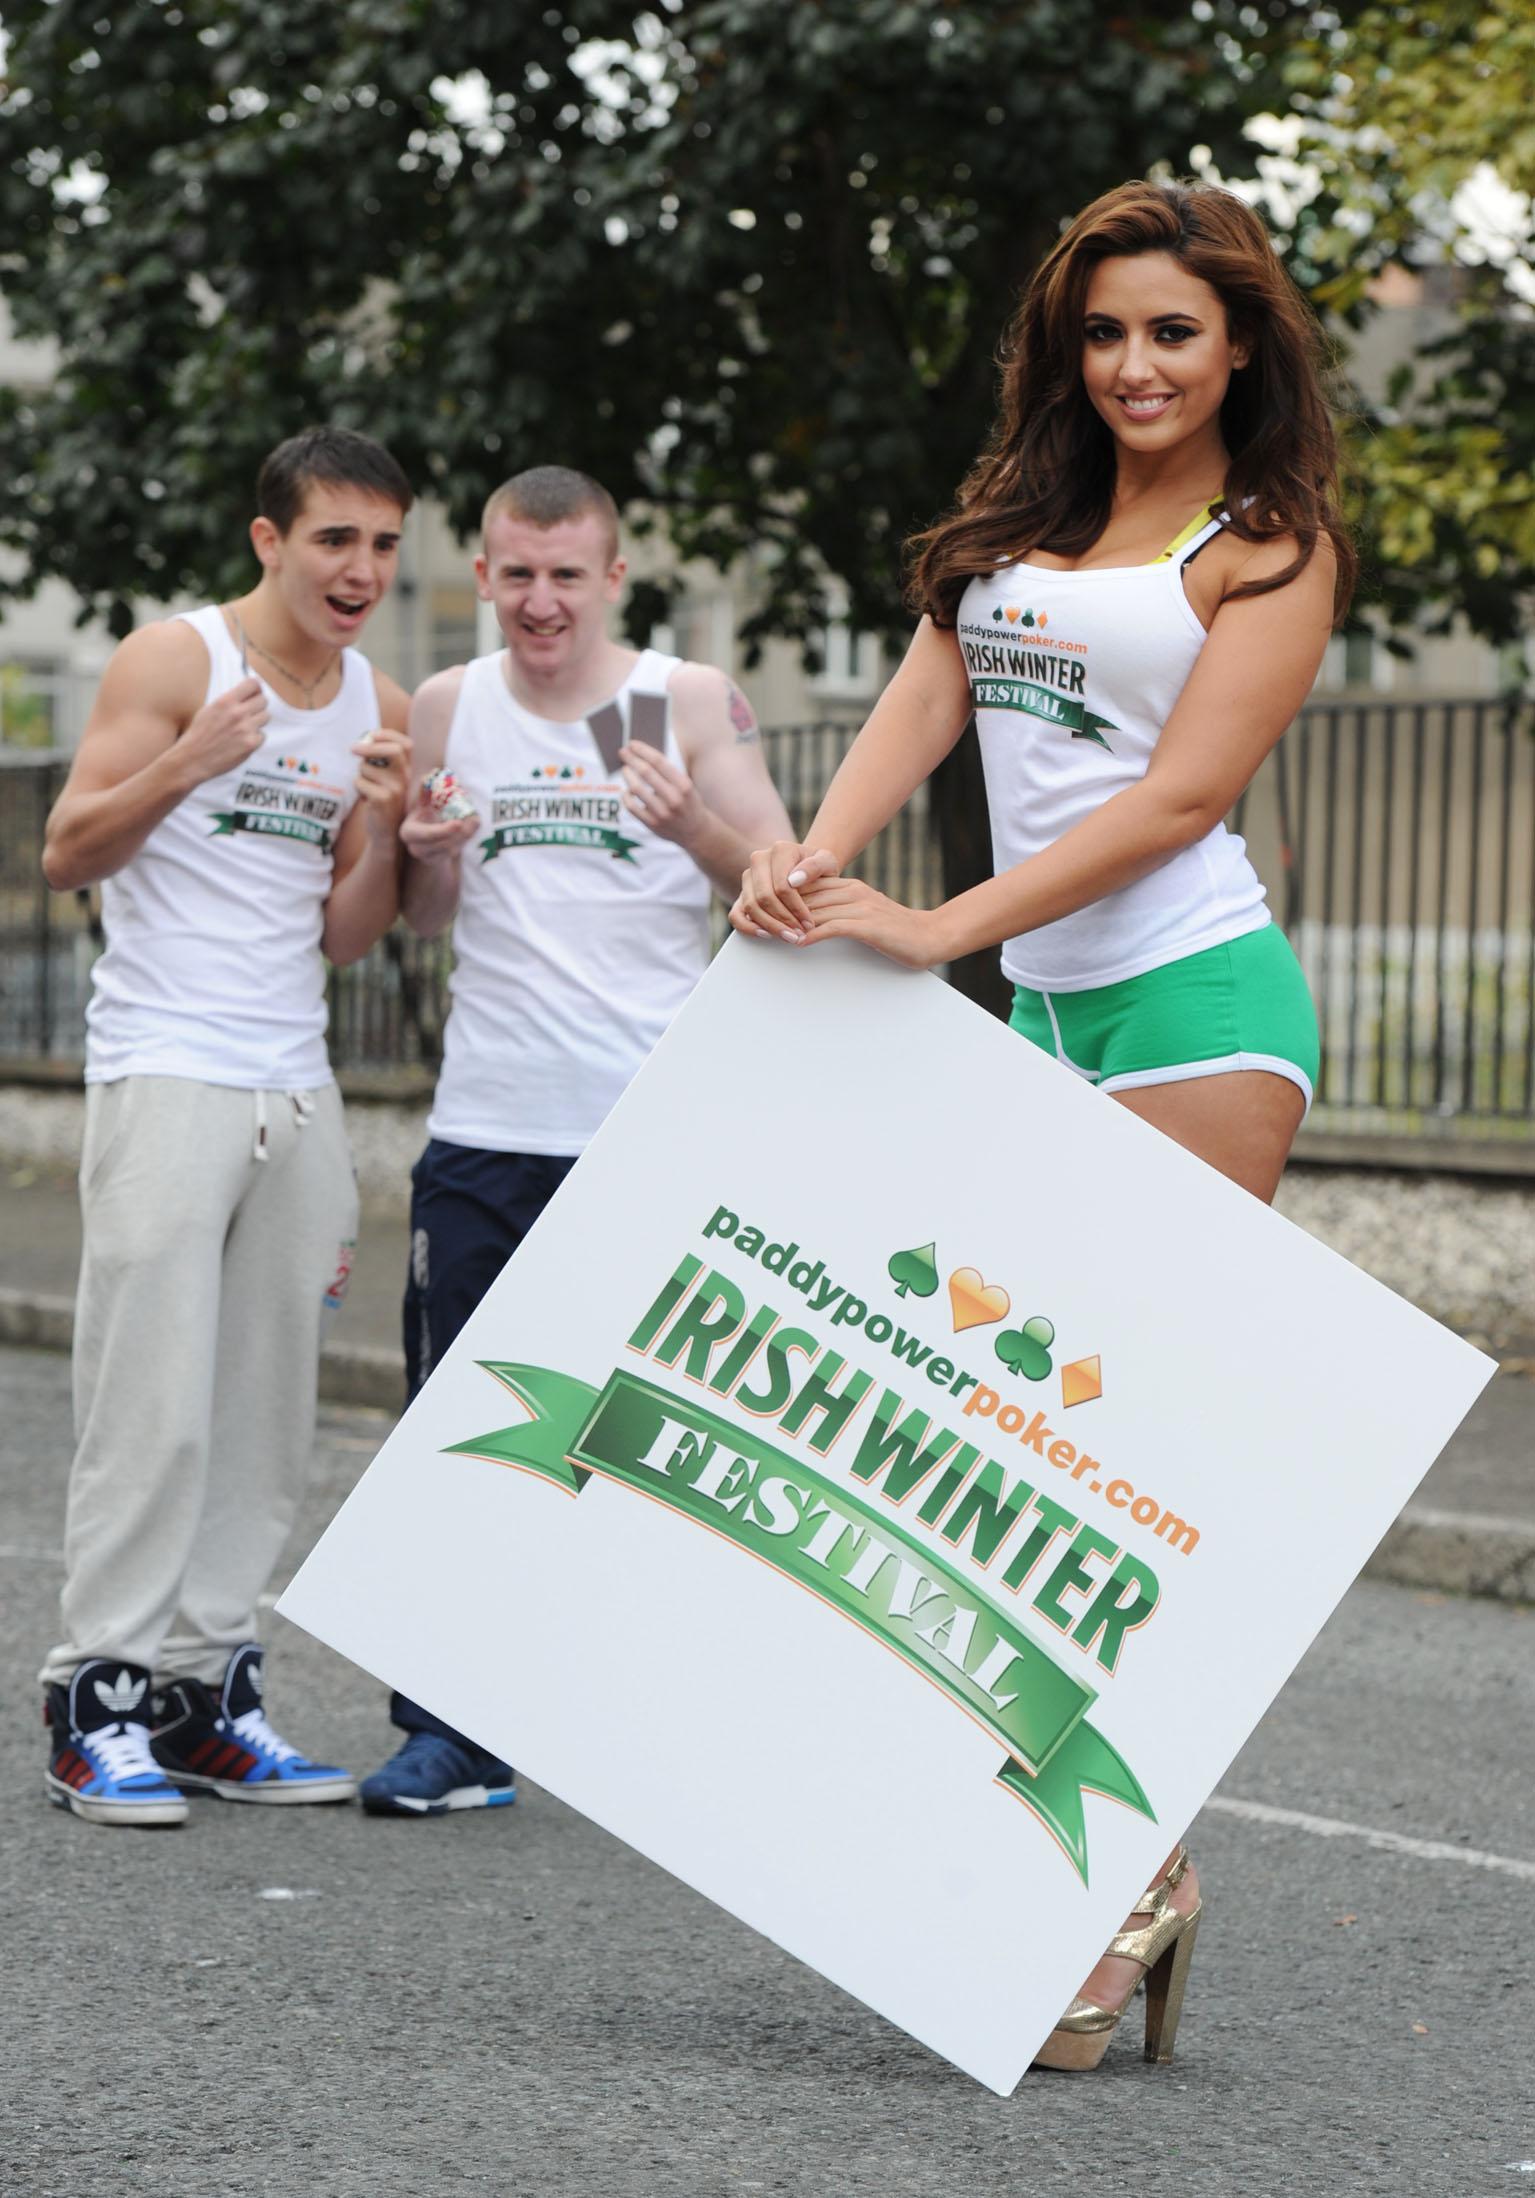 Irish Winter Poker Festival